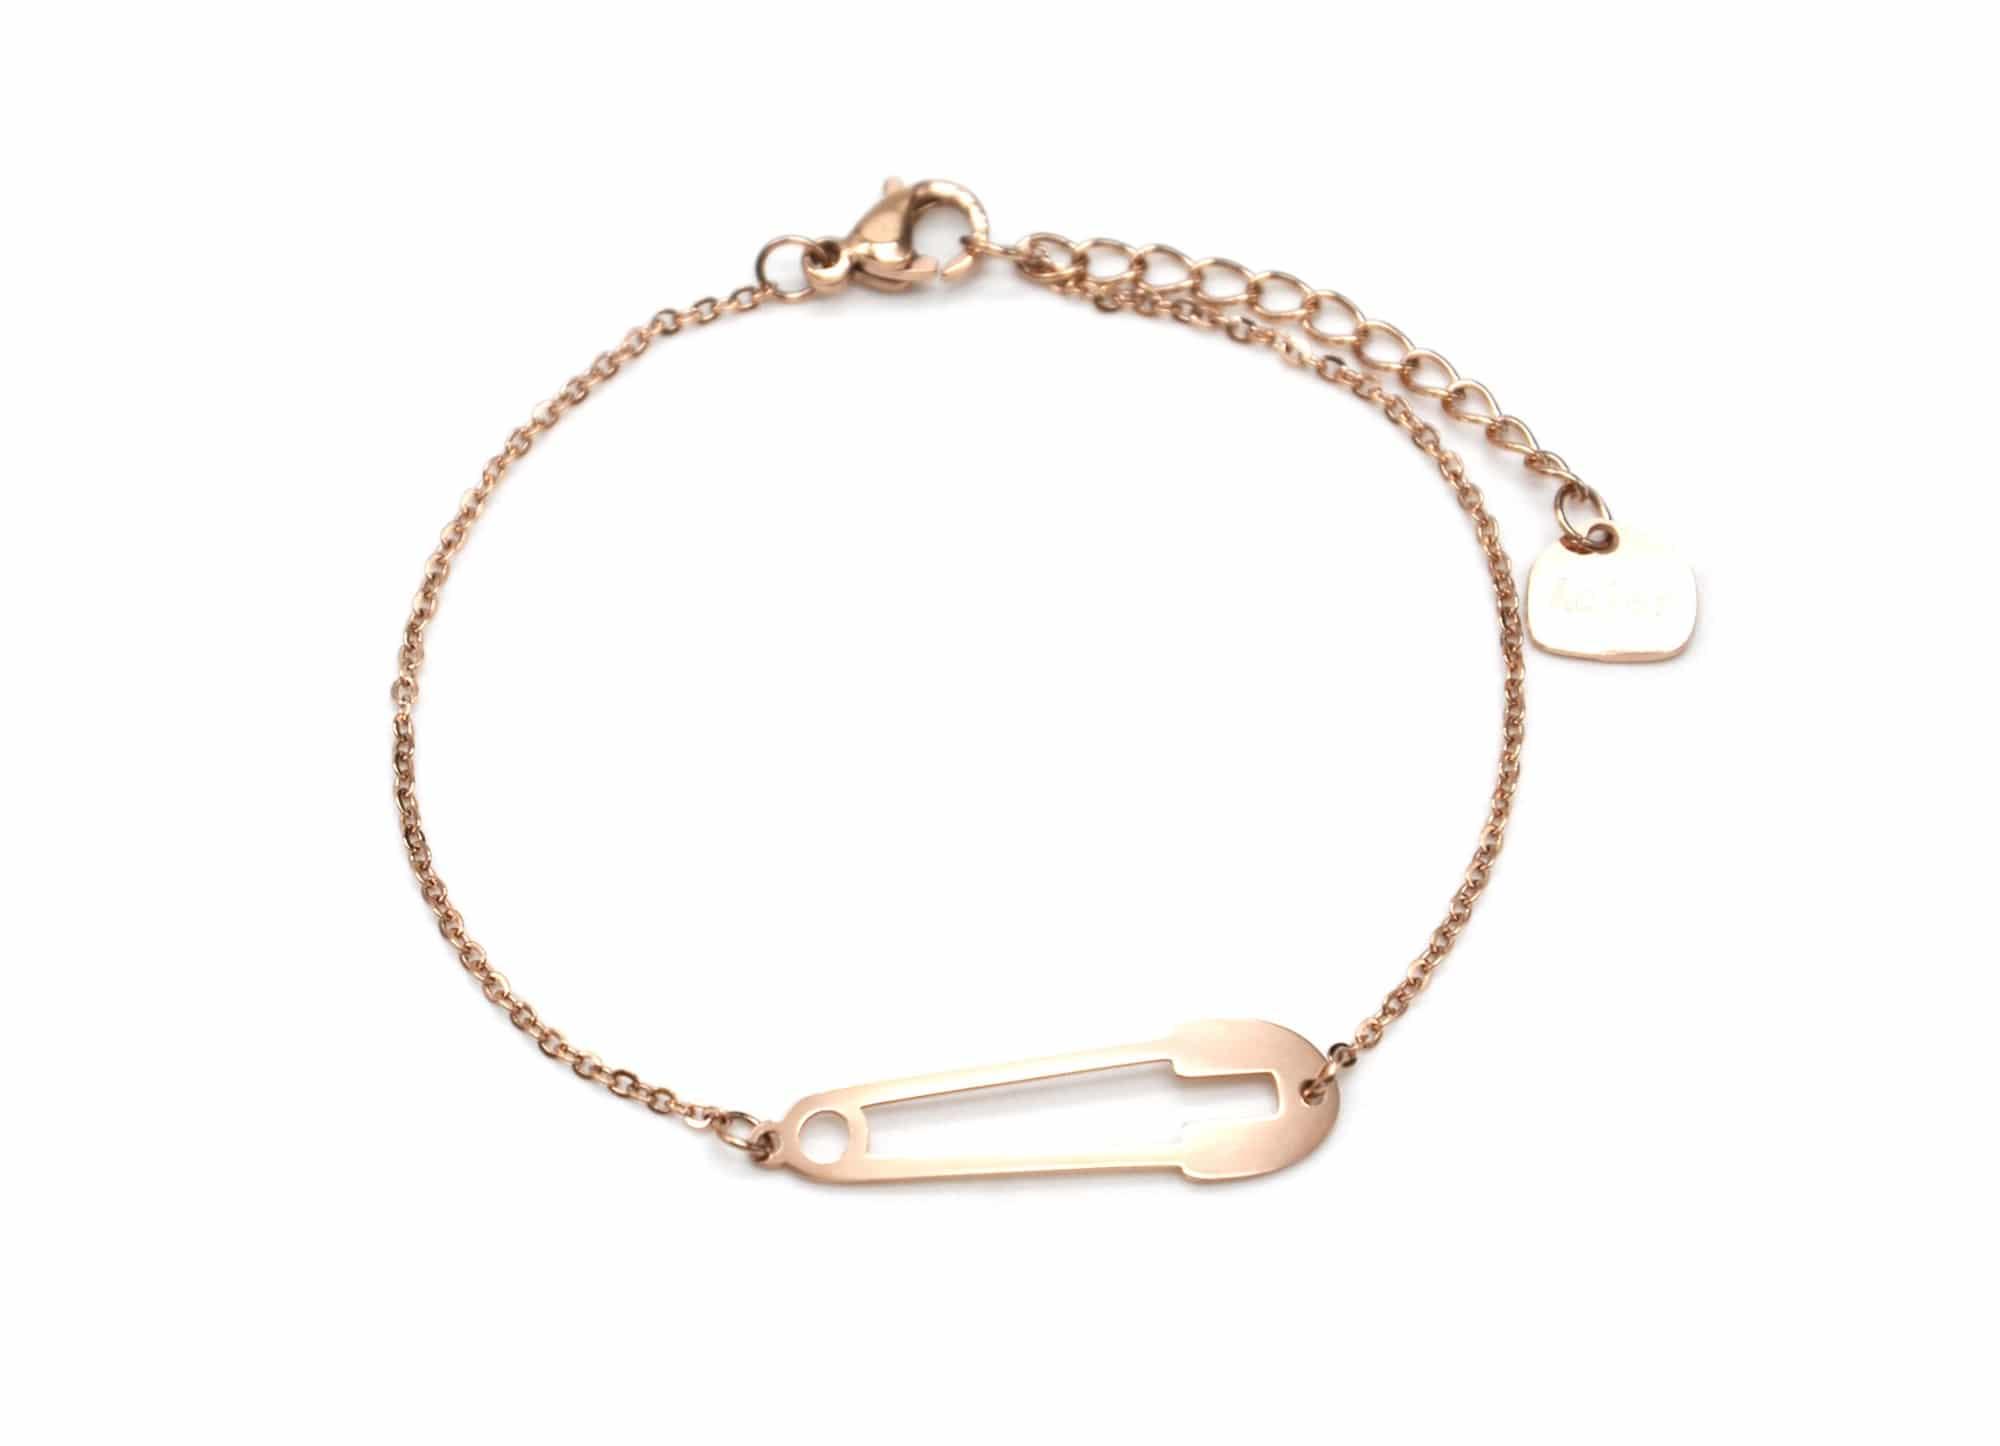 bc2632f bracelet fine cha ne avec charm epingle nourrice acier or rose oh my shop. Black Bedroom Furniture Sets. Home Design Ideas